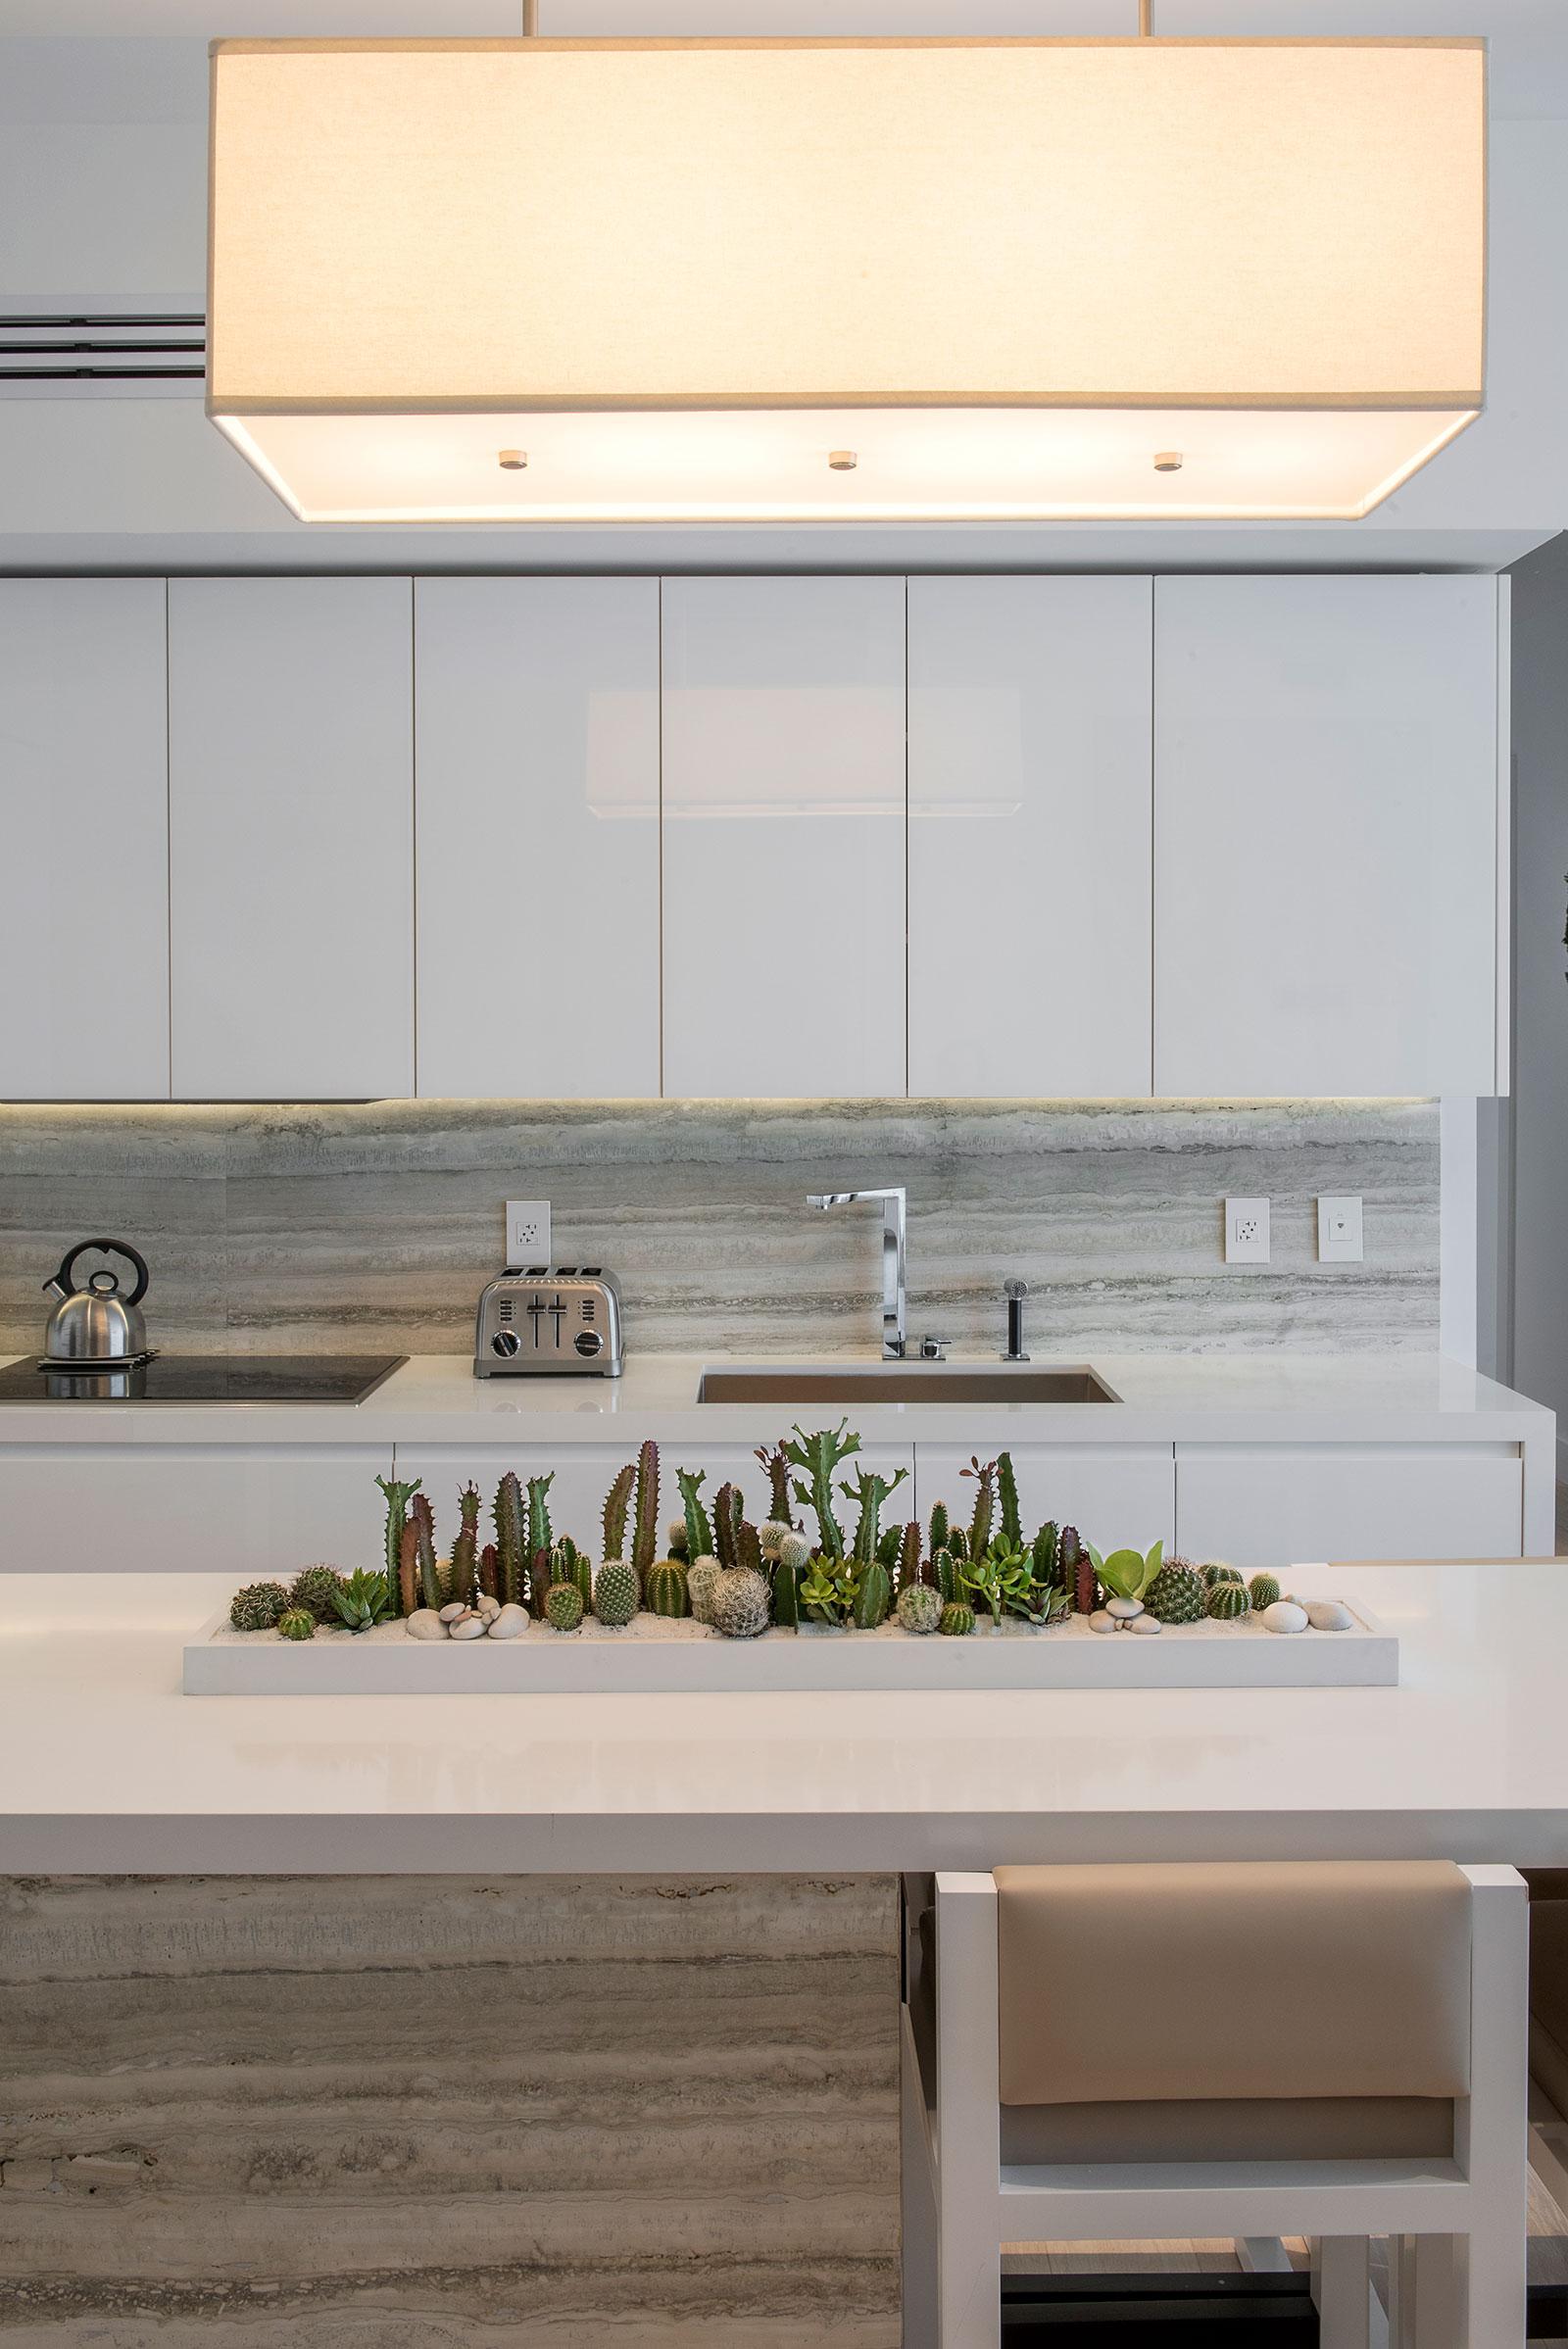 1-Homes-South-Beach-Kitchen-Photo-by-Livio-Mancinelli-Courtesy-of ...